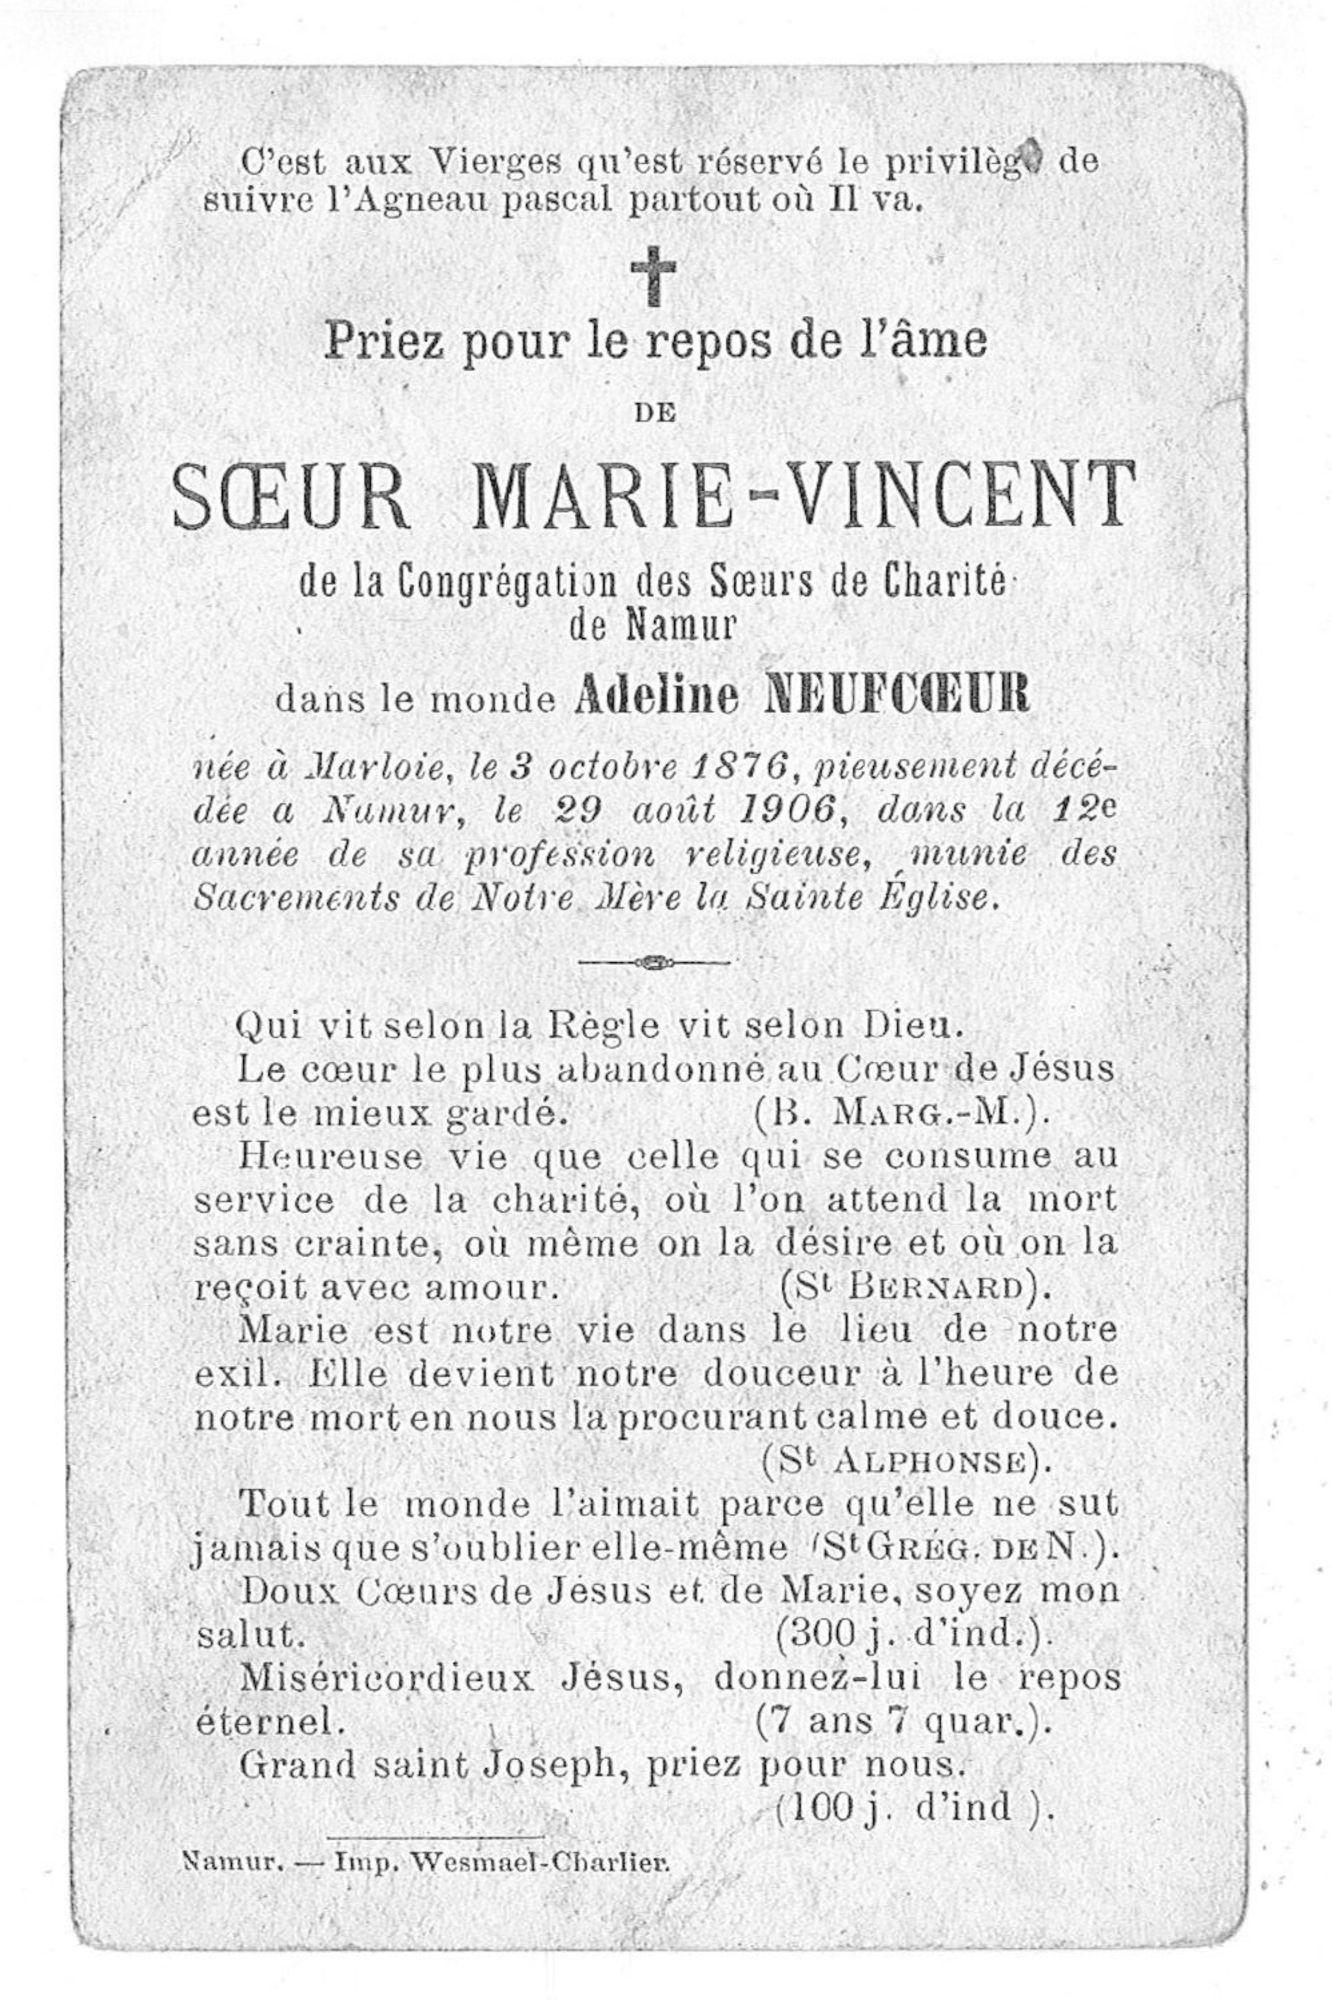 Adeline Neufcoeur